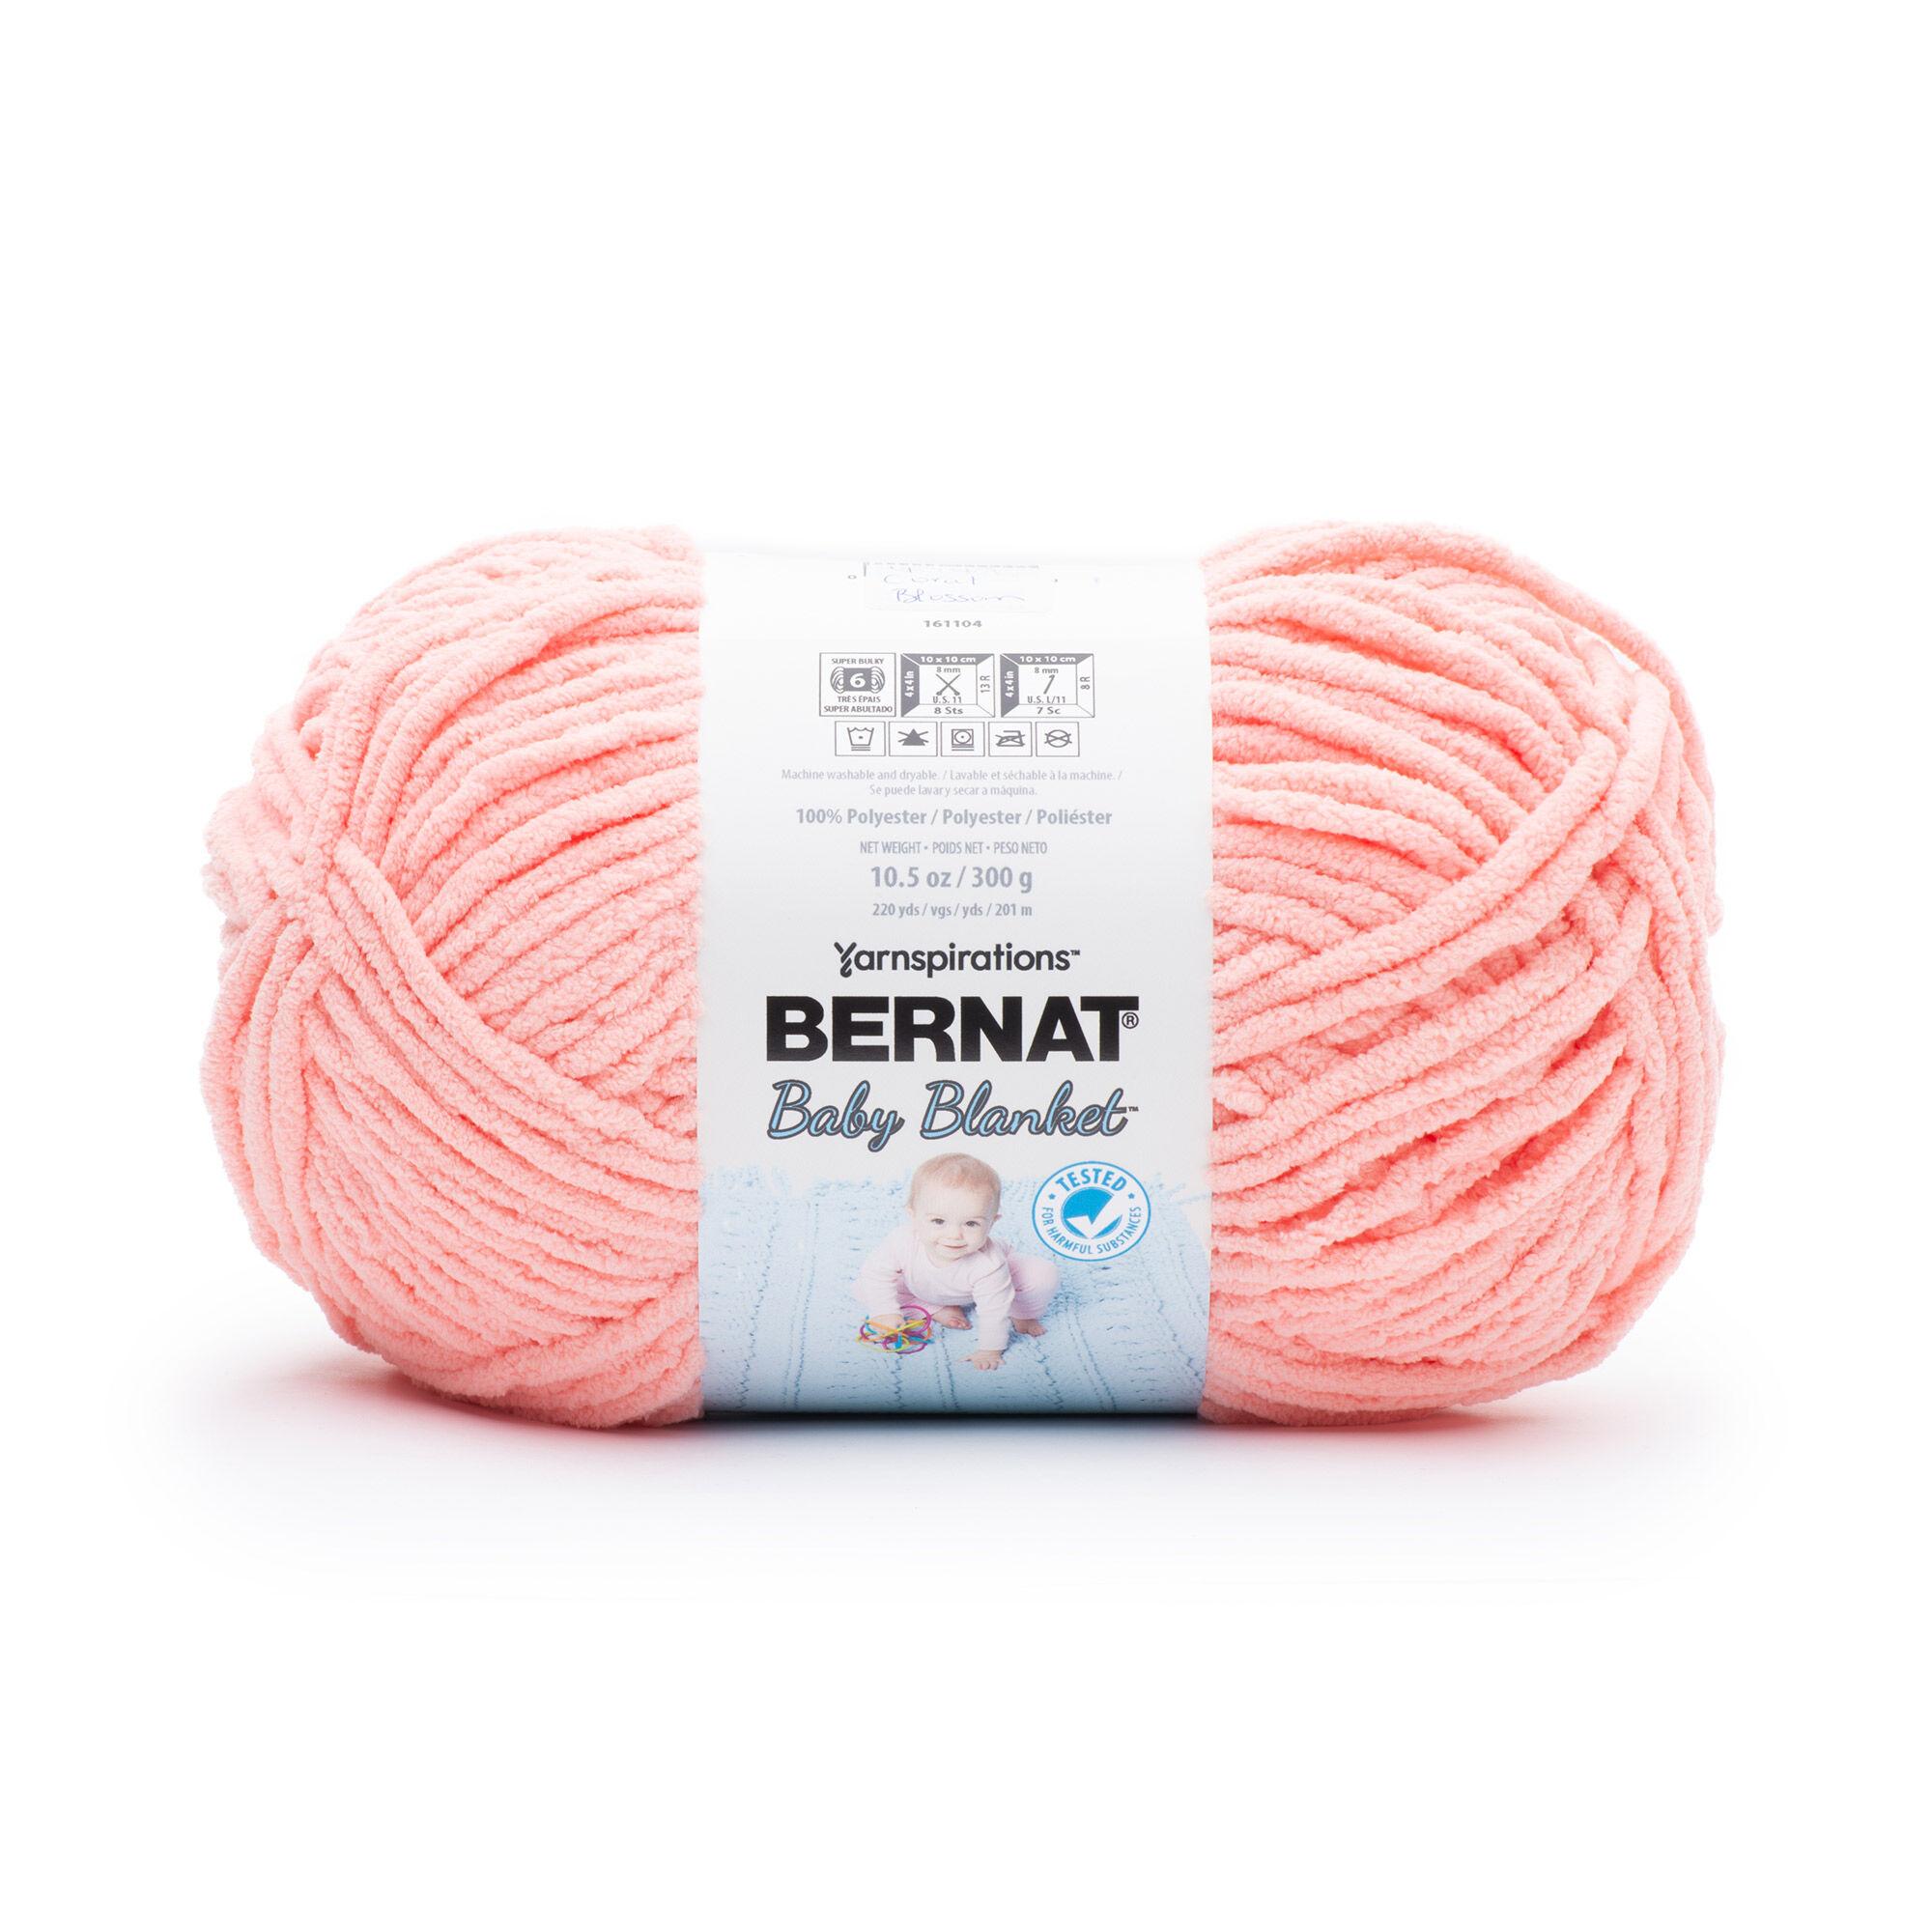 NWT Bernat Baby Blanket Tiny Yarn Wishing Well Polyester 4-Medium Worsted 3.5oz